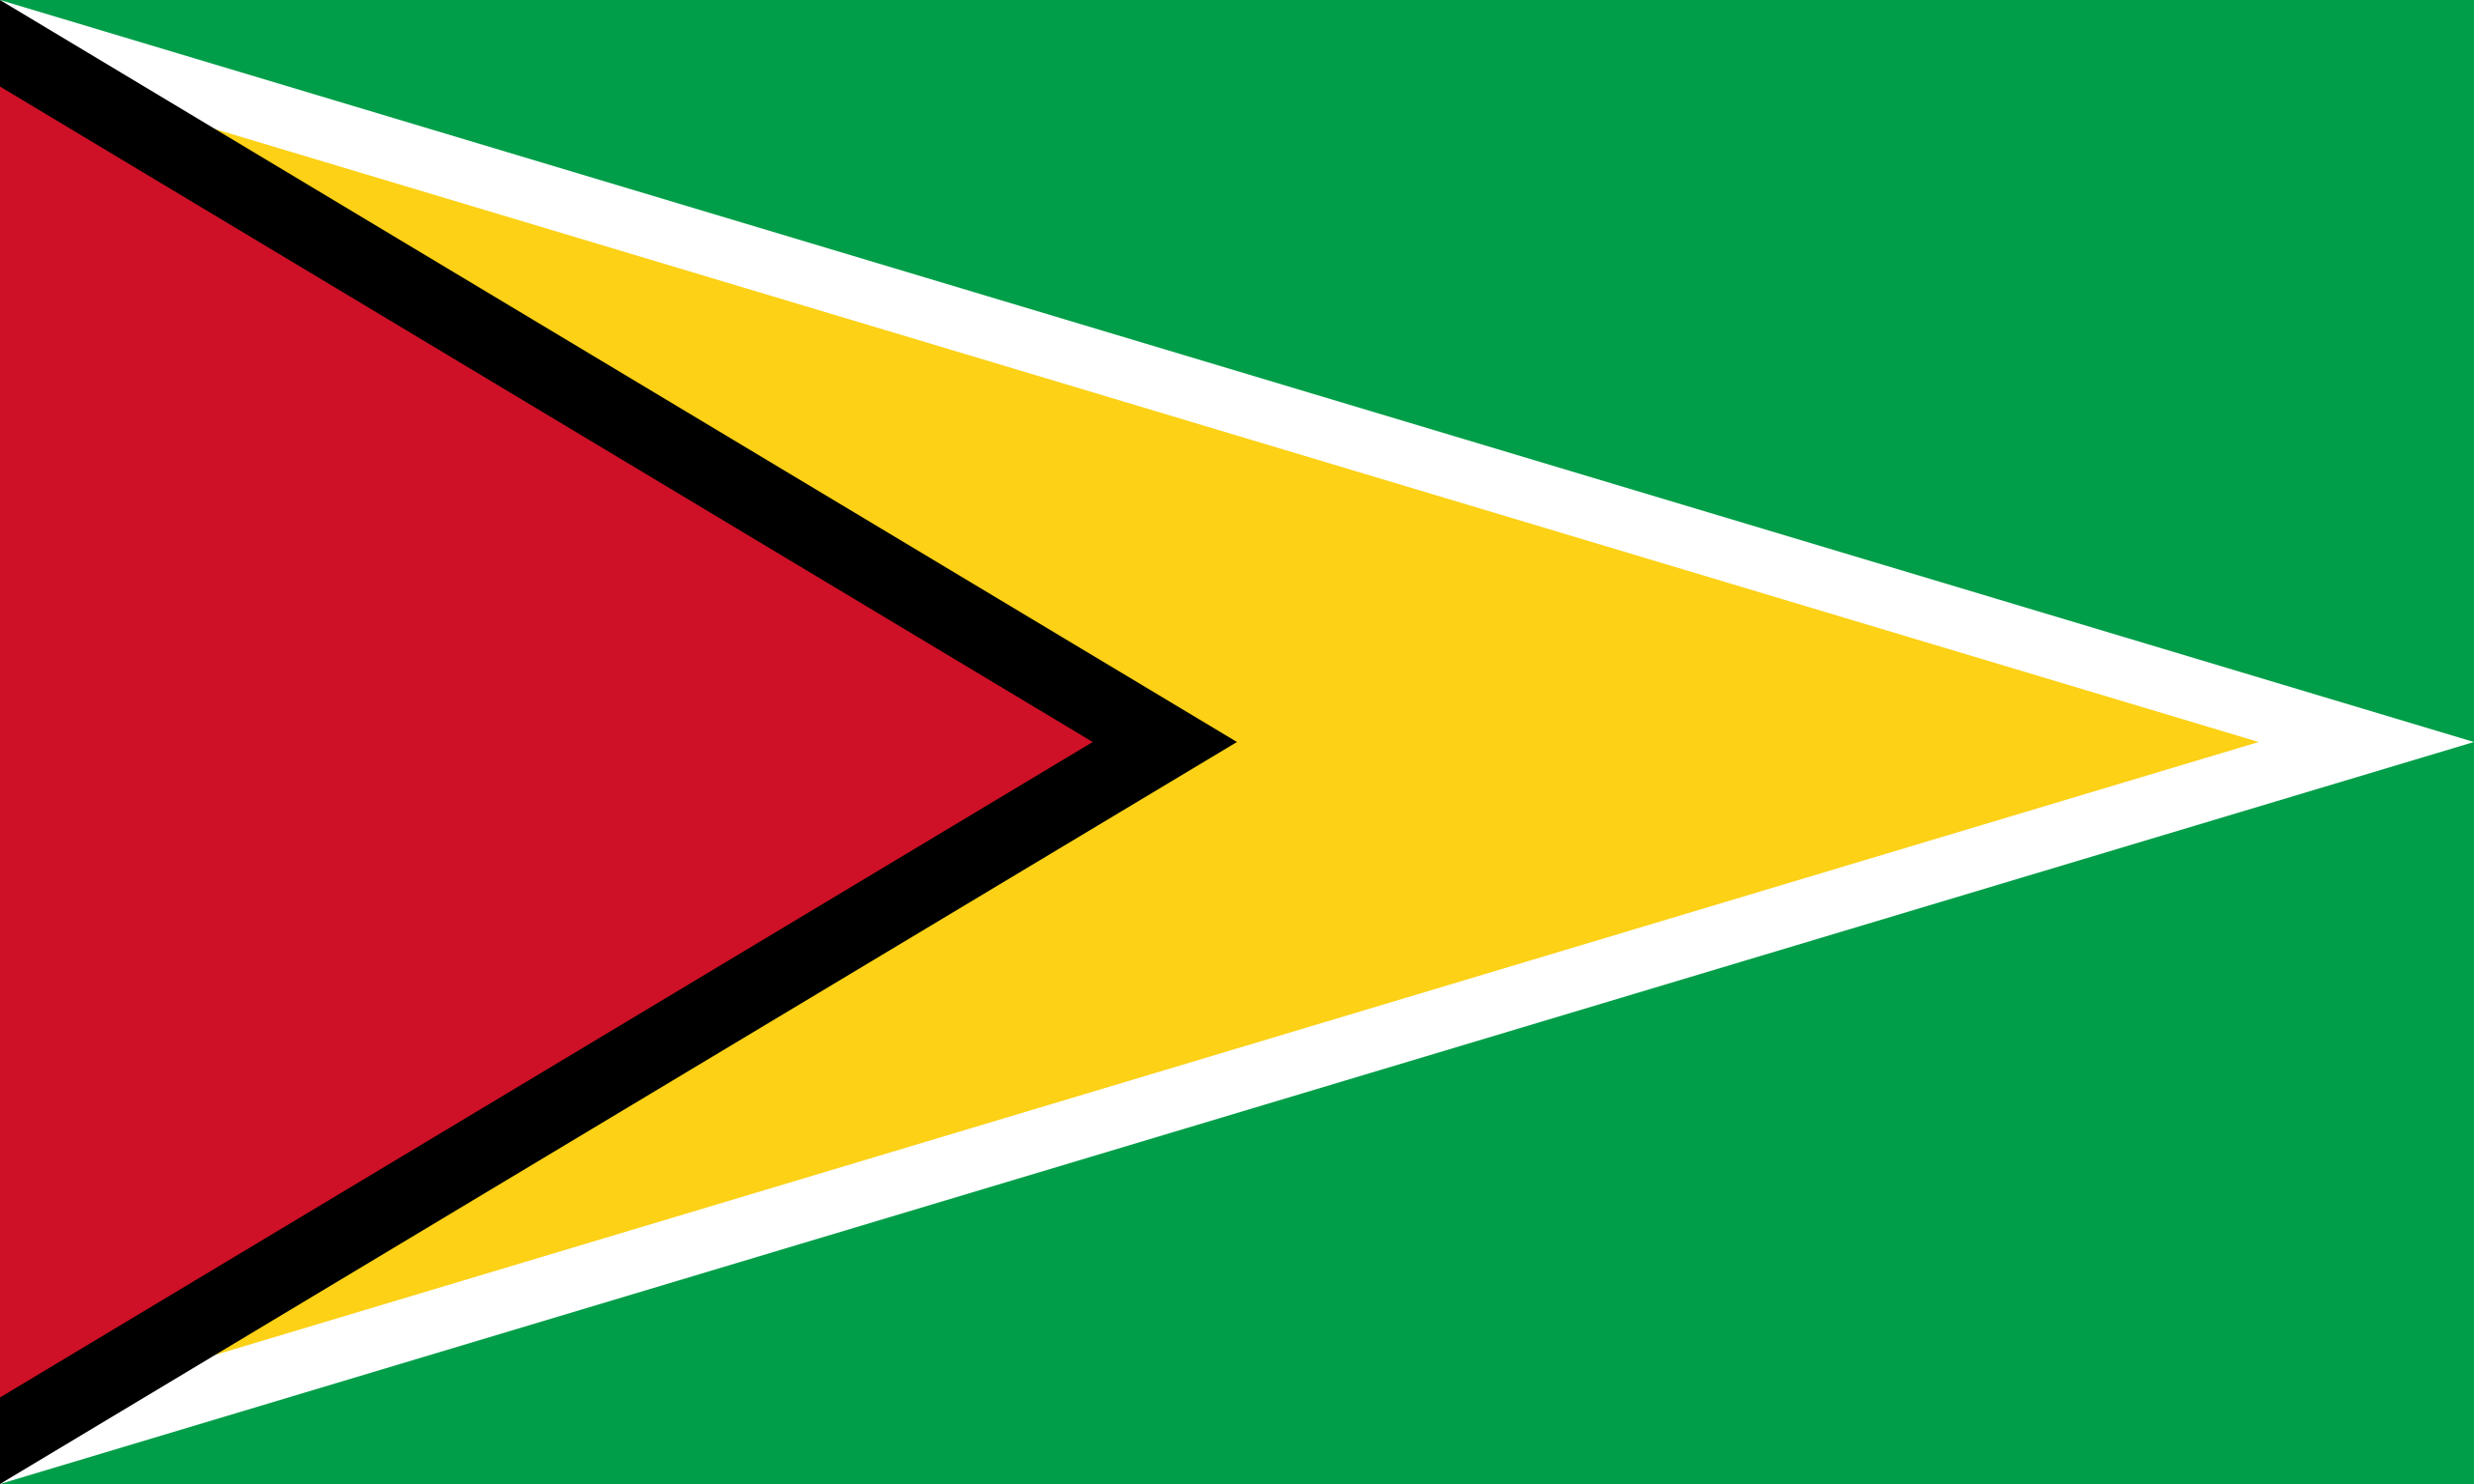 guyana, país, emblema, insignia, シンボル - HD の壁紙 - 教授-falken.com